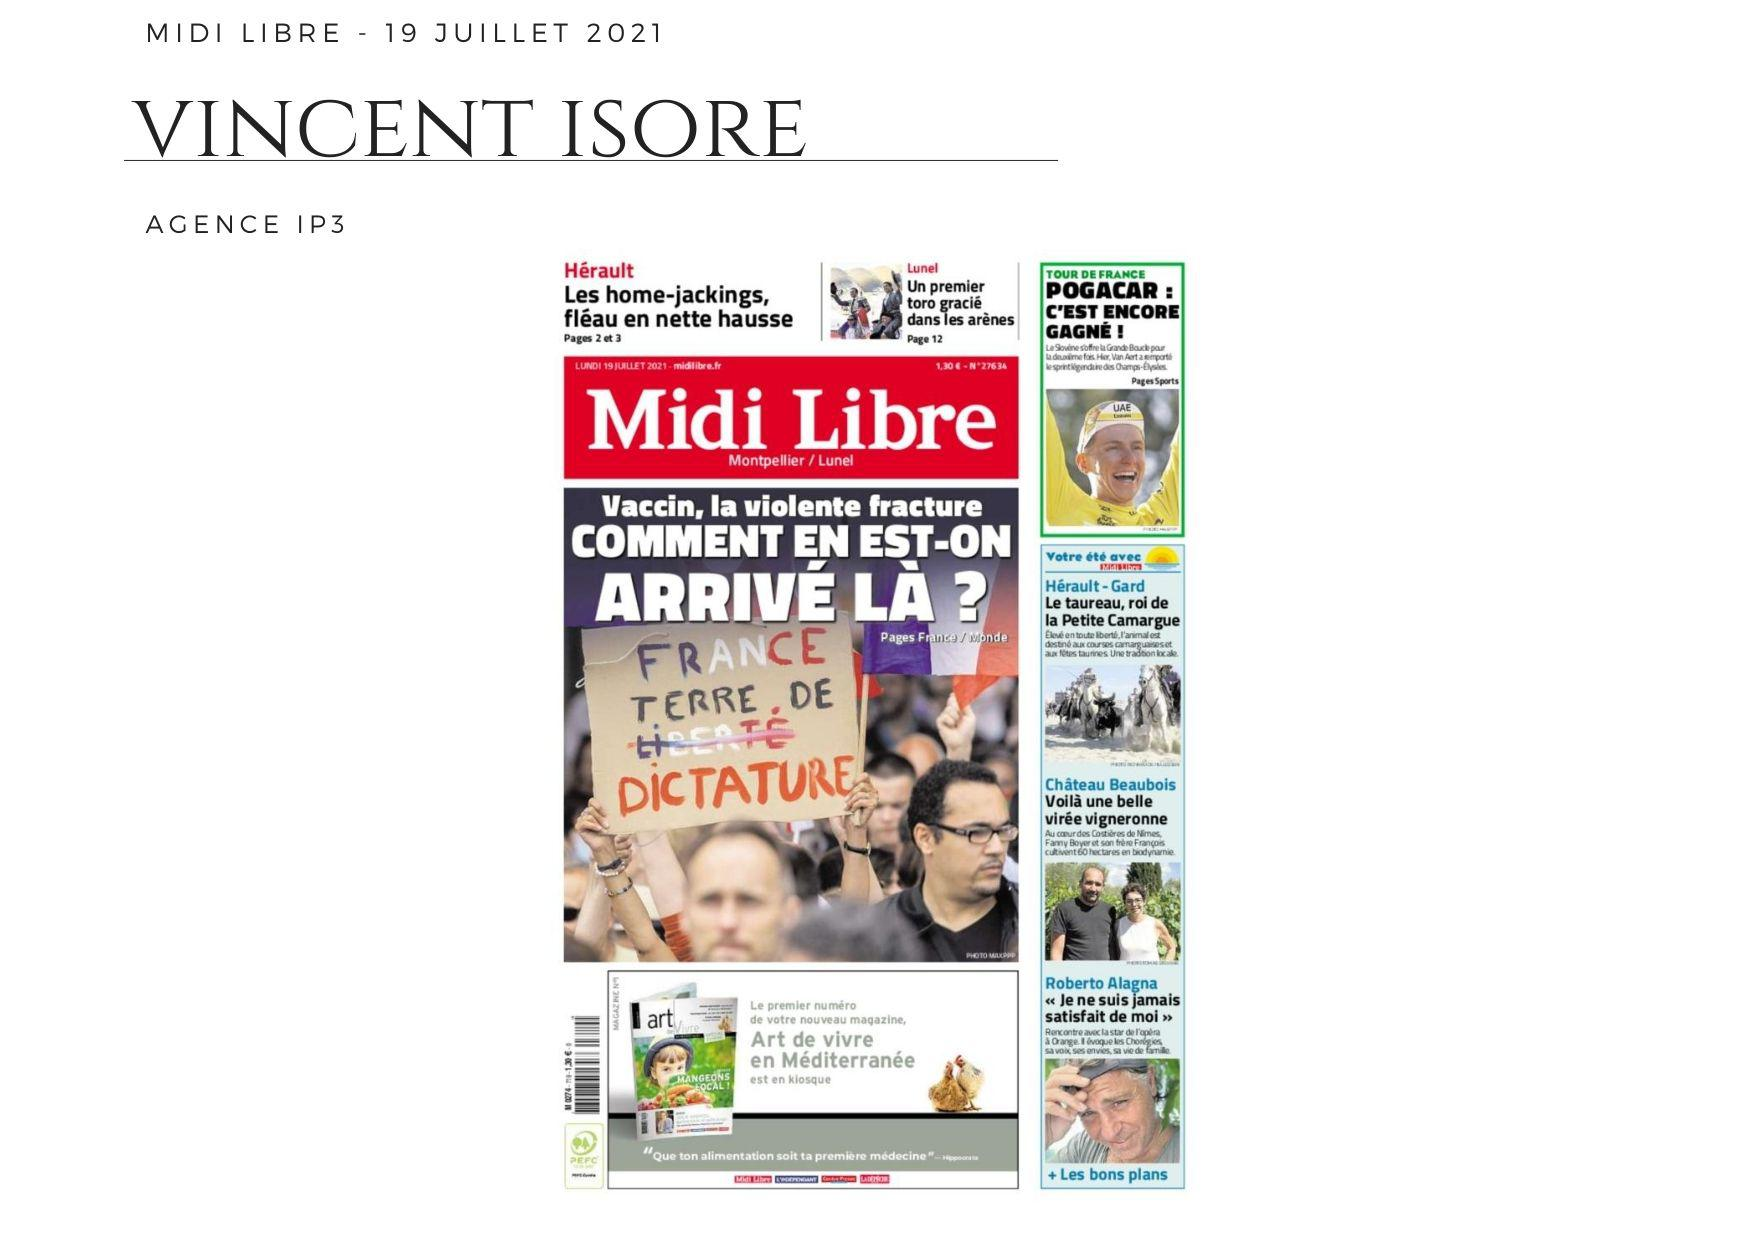 Midi Libre - 19 juillet 2021